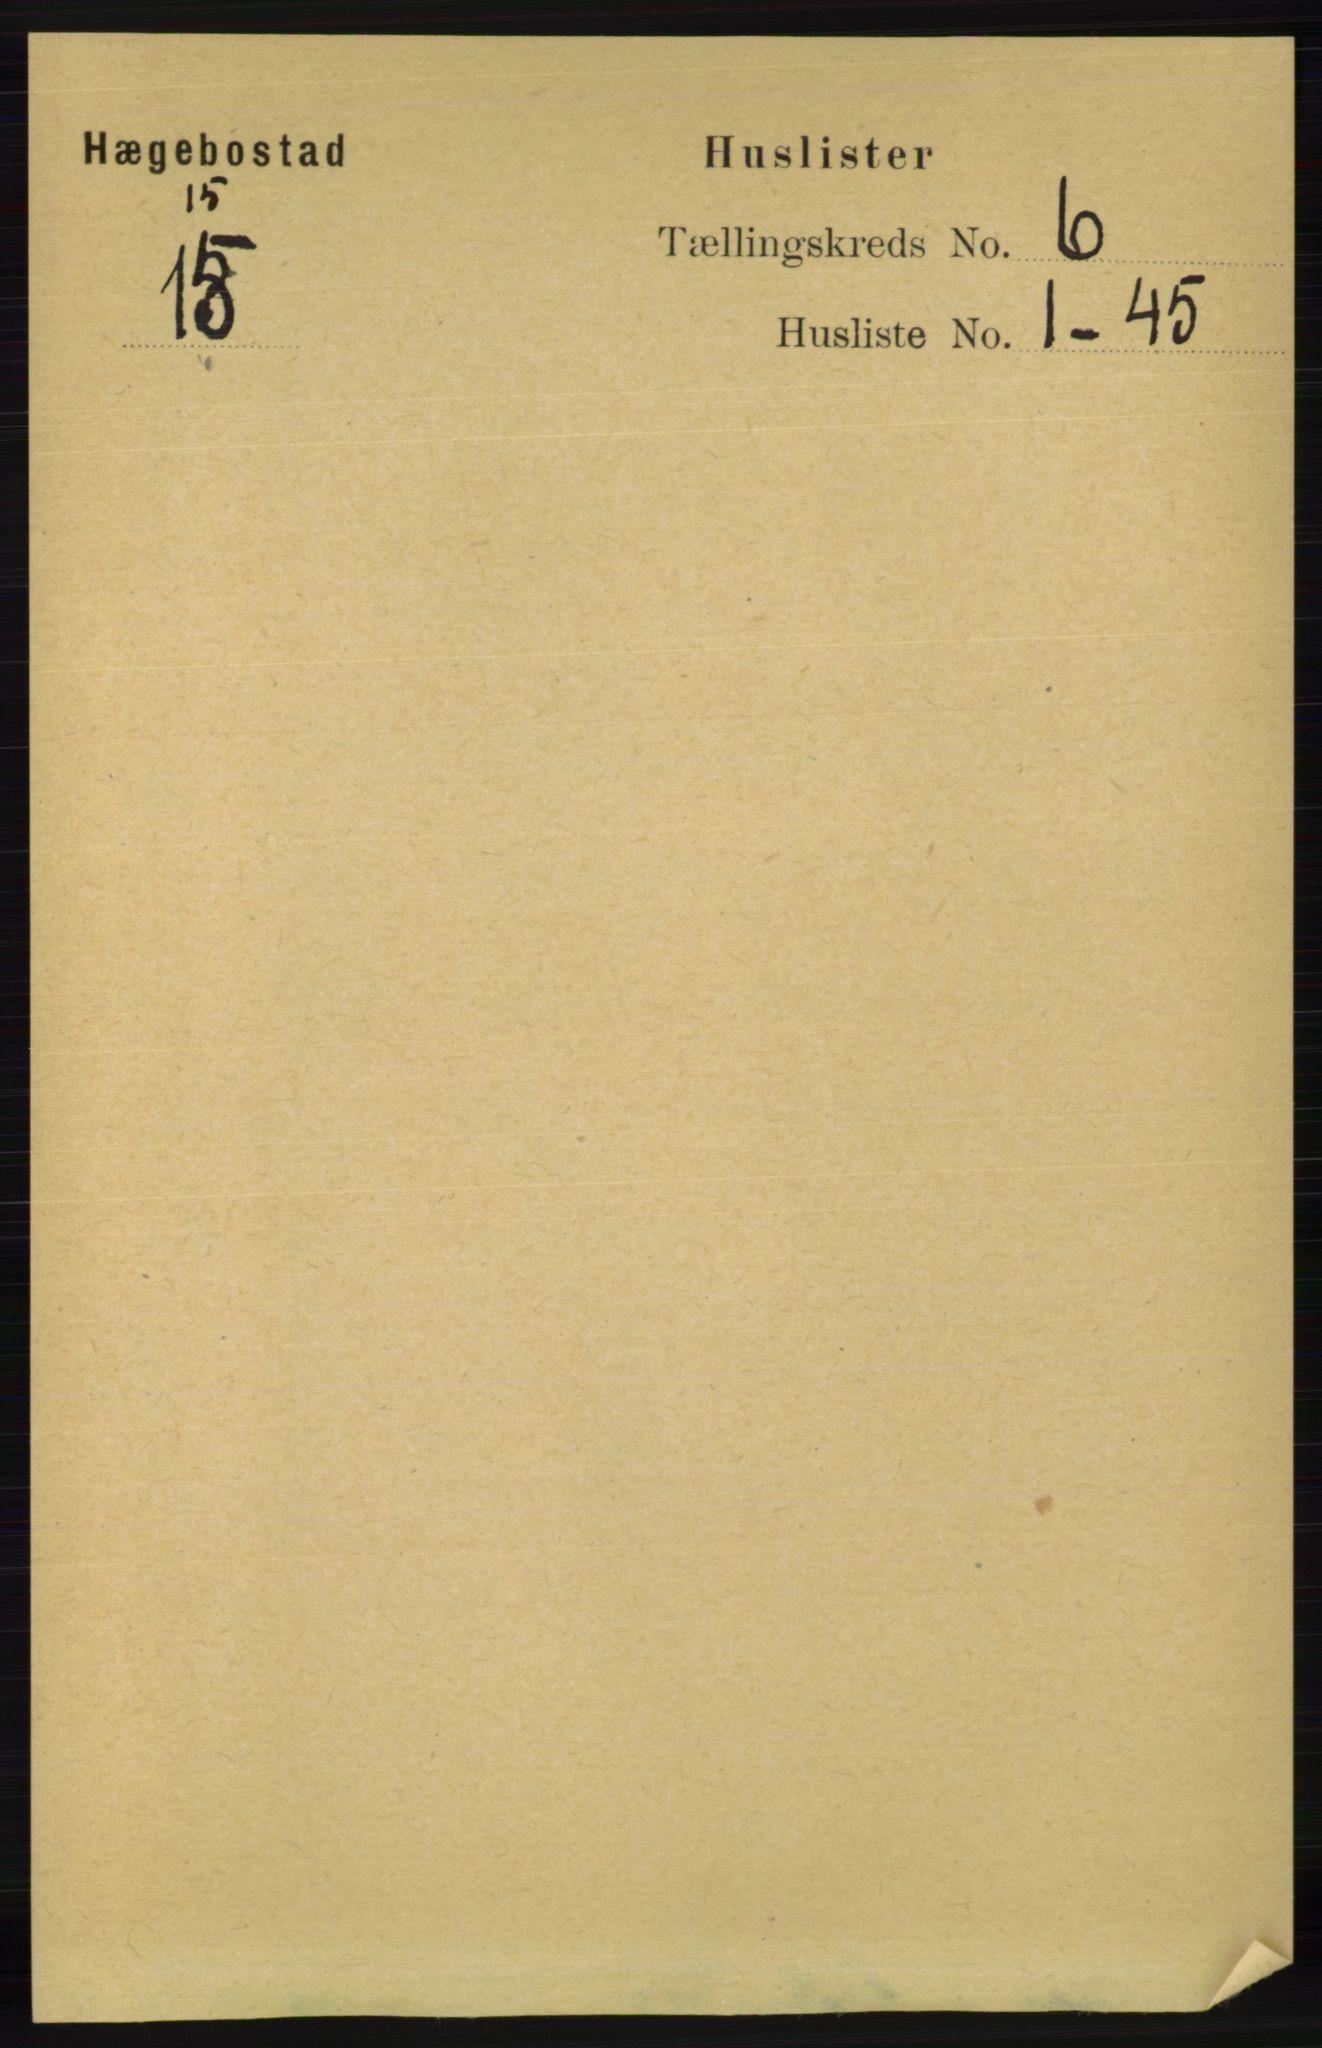 RA, Folketelling 1891 for 1034 Hægebostad herred, 1891, s. 1796